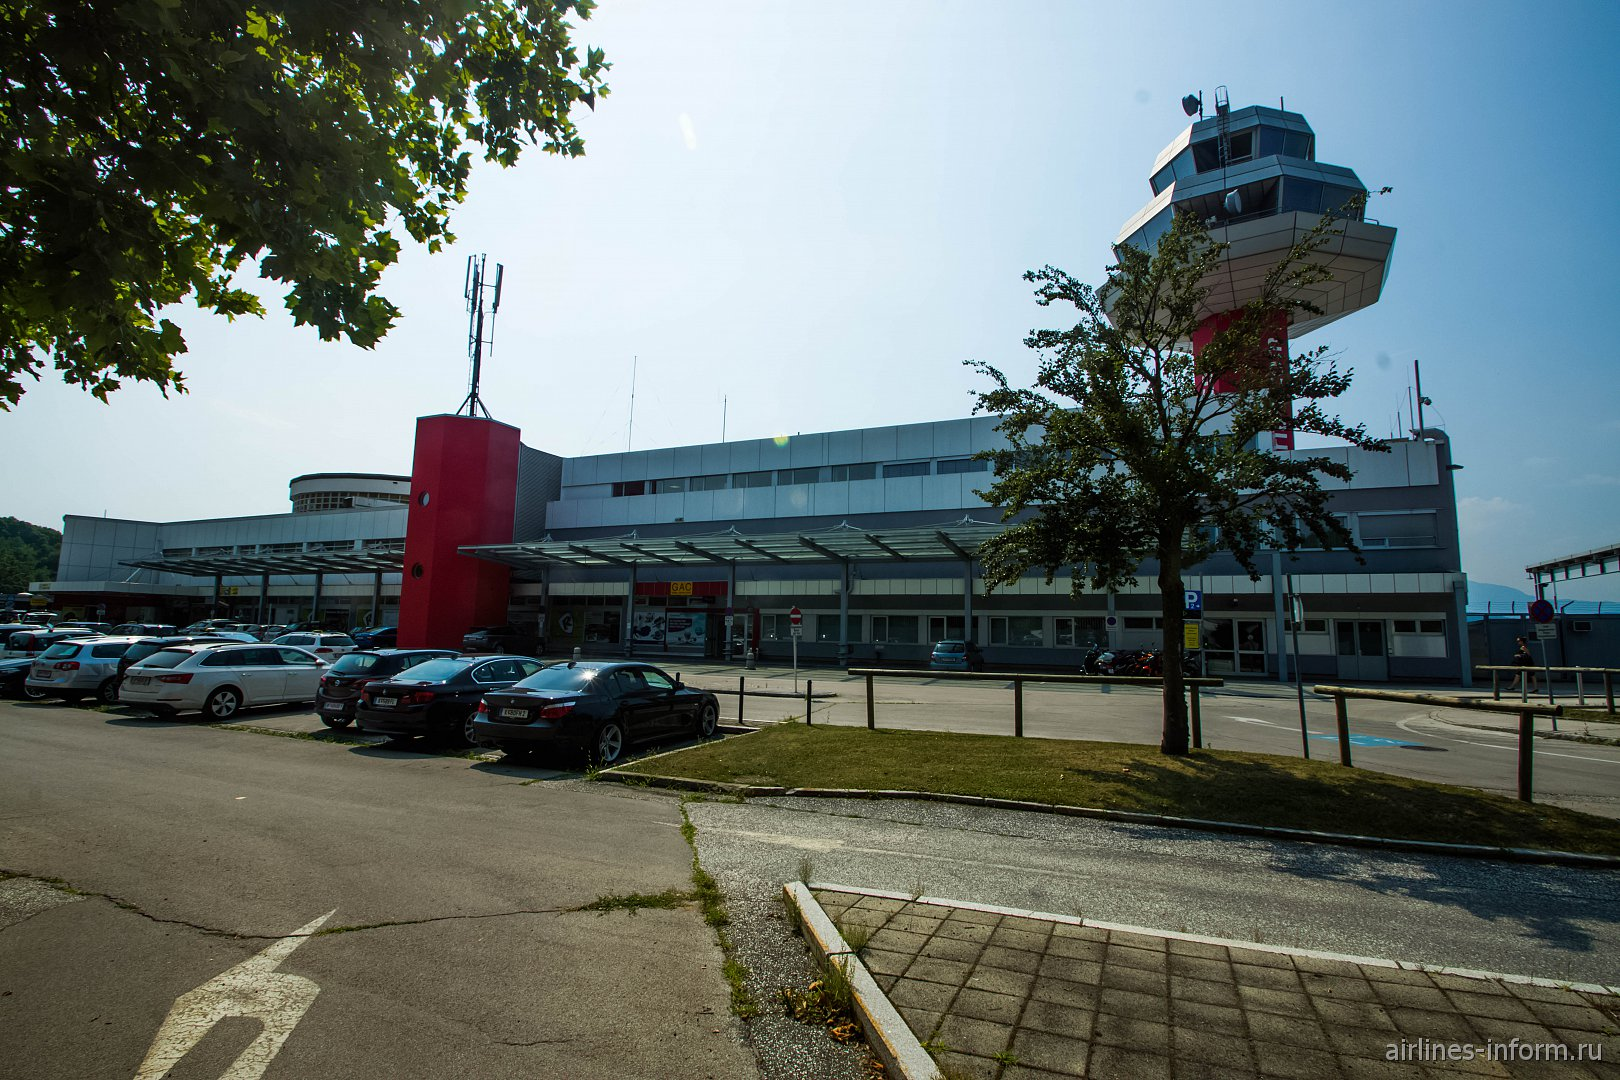 Юбилей. Аэропорт Клагенфурт Альпе-Адриа, Австрия